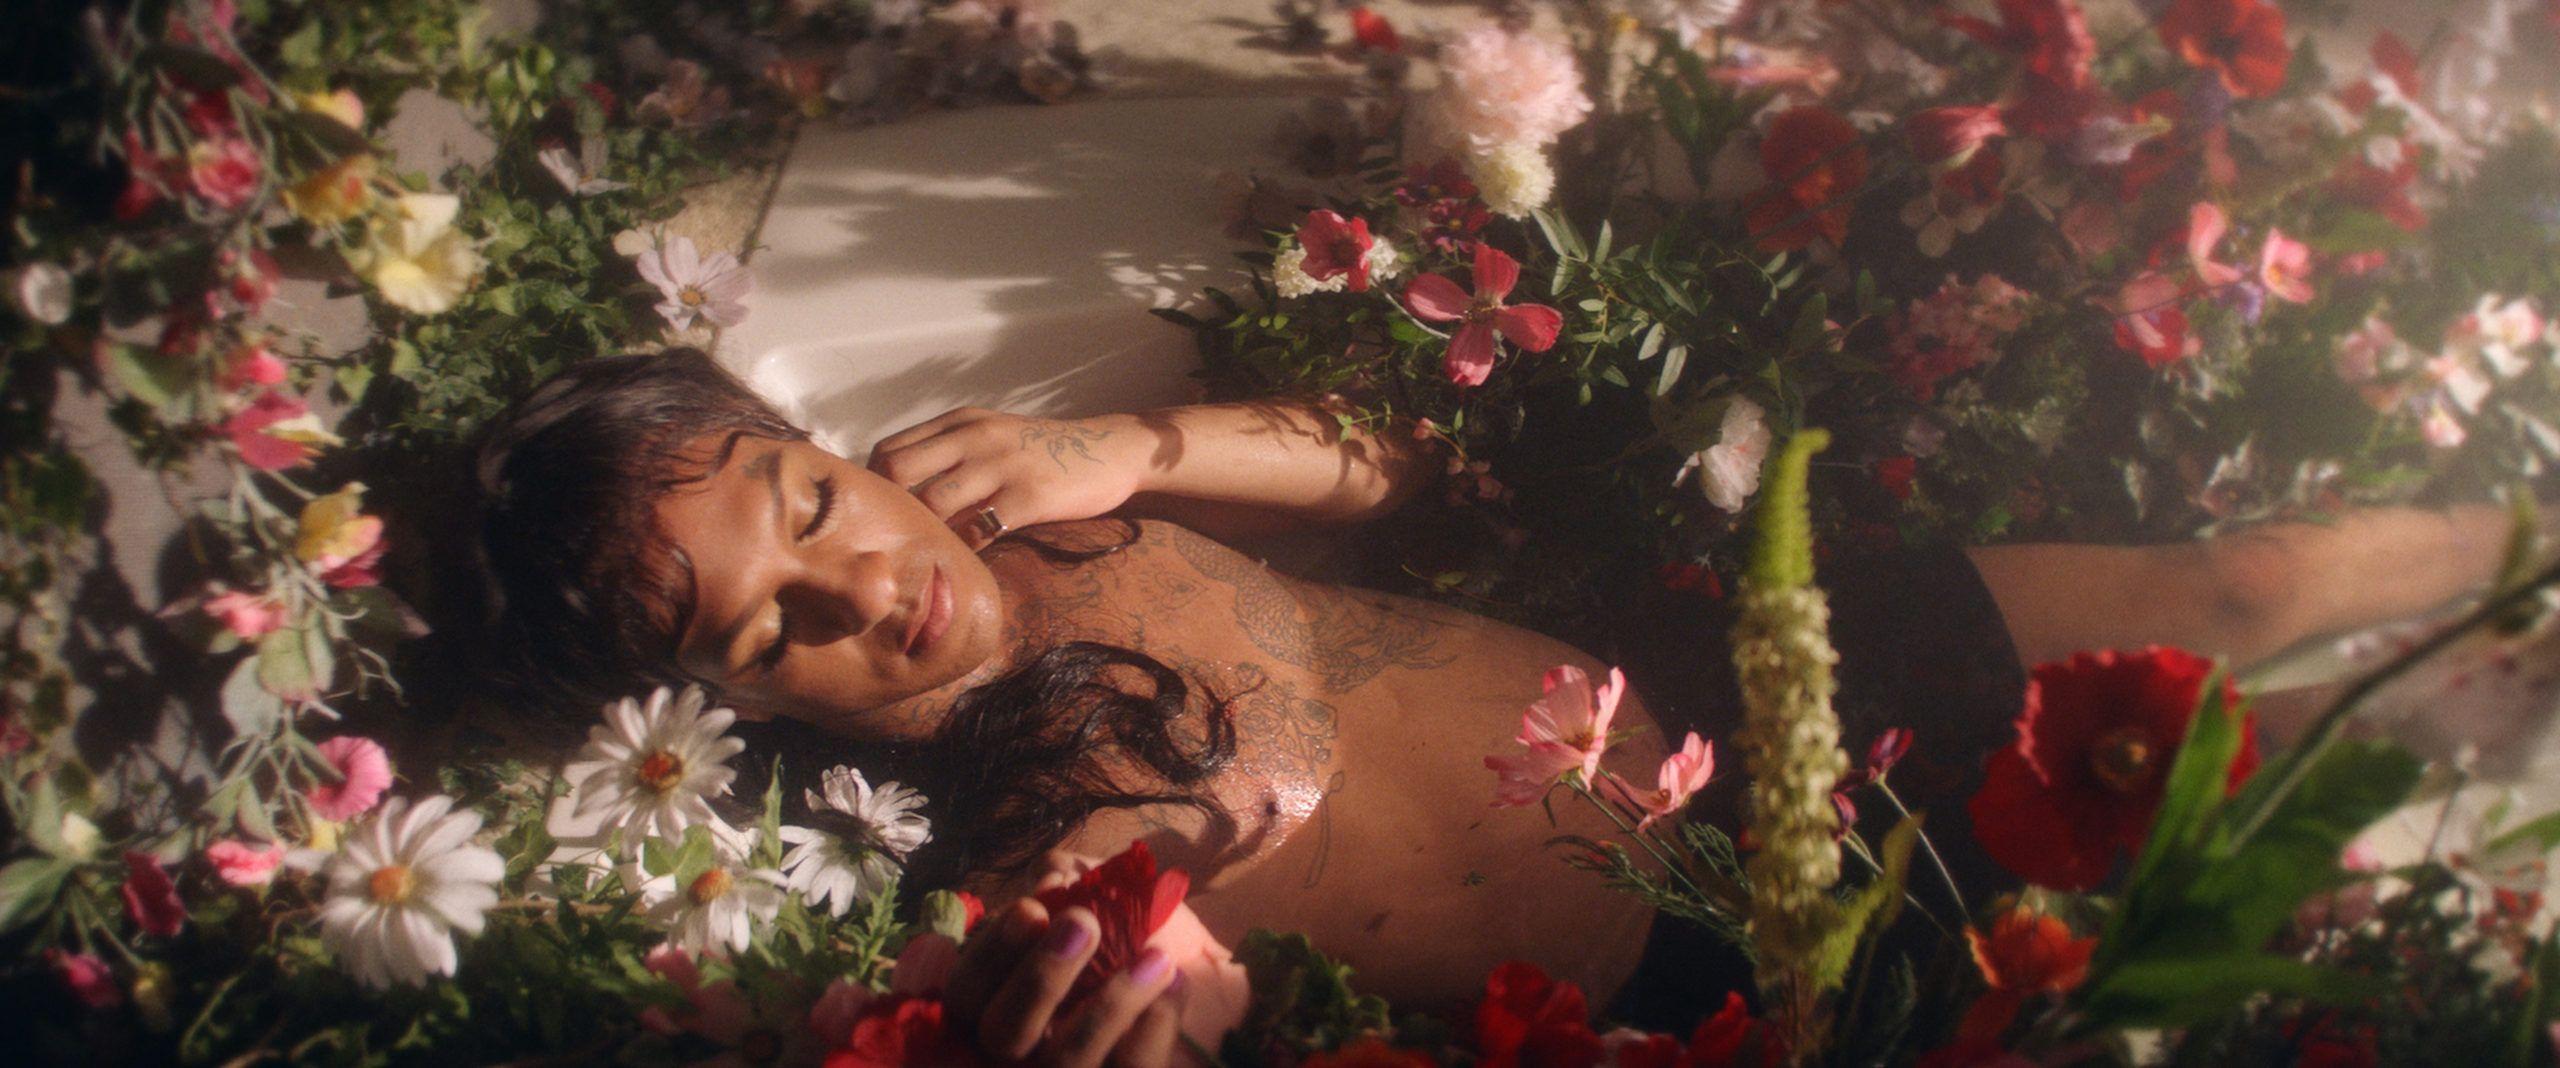 Sicilia Queer filmfest, il Premio Nino Gennaro all'artista Mykki Blanco